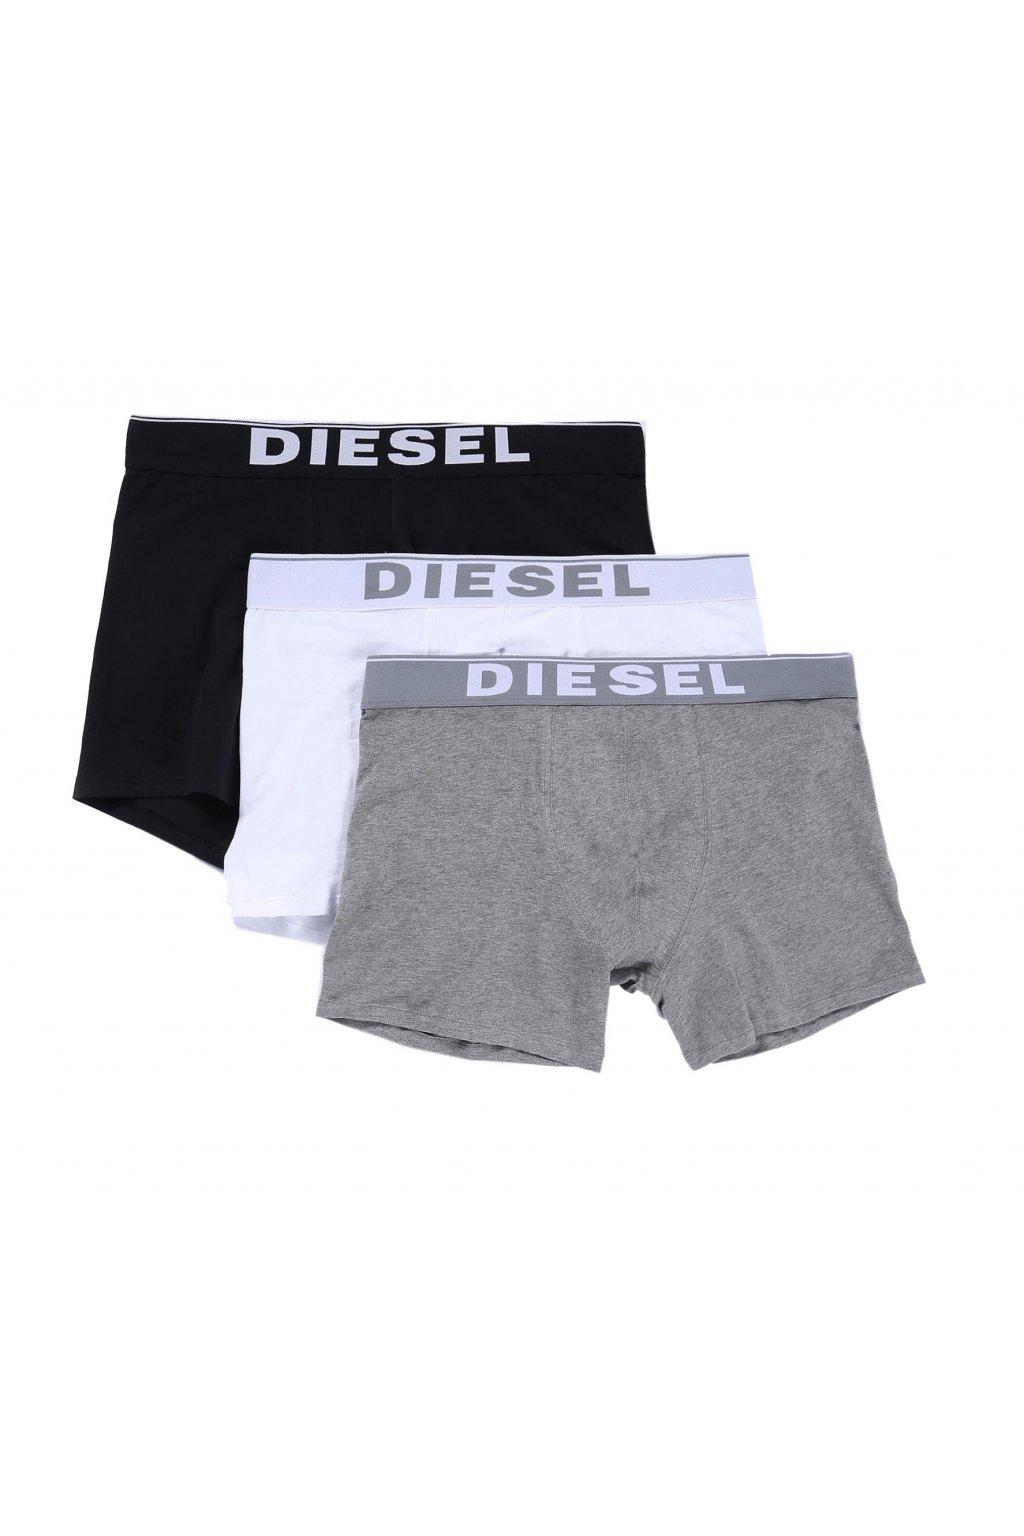 Diesel Logo Boxerky - 3 balení